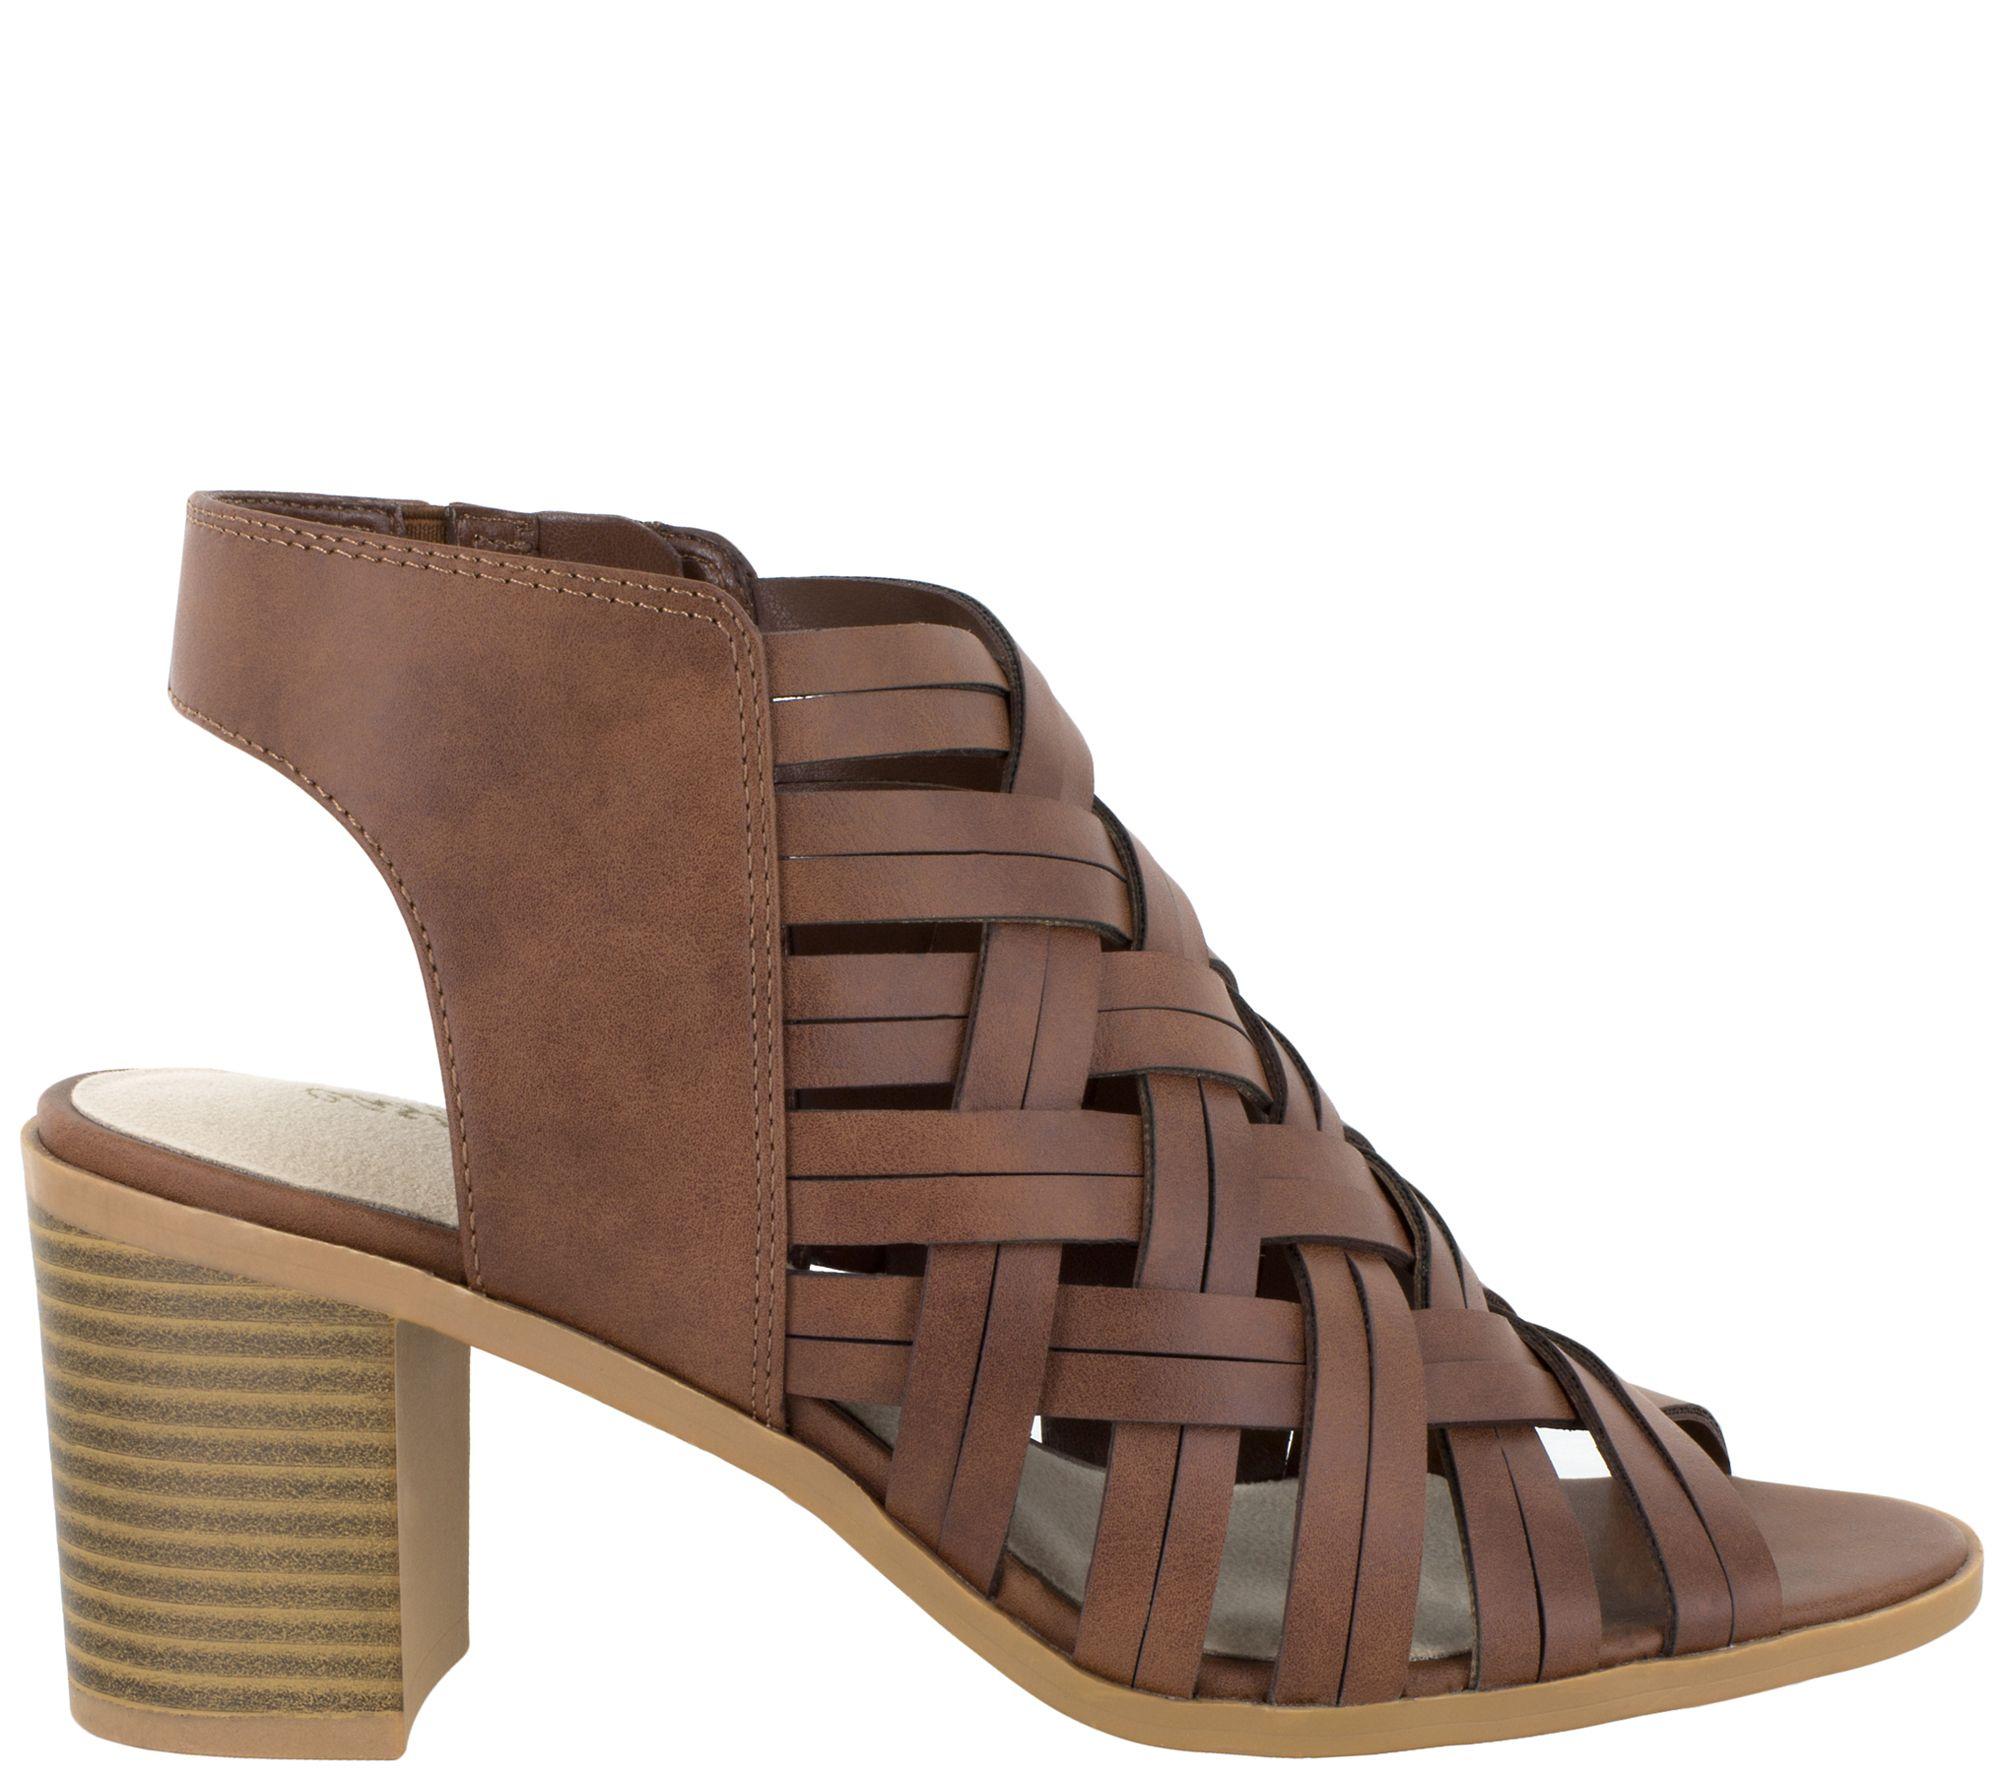 ccb252541 Easy Street Block Heel Sandals - Angel - Page 1 — QVC.com